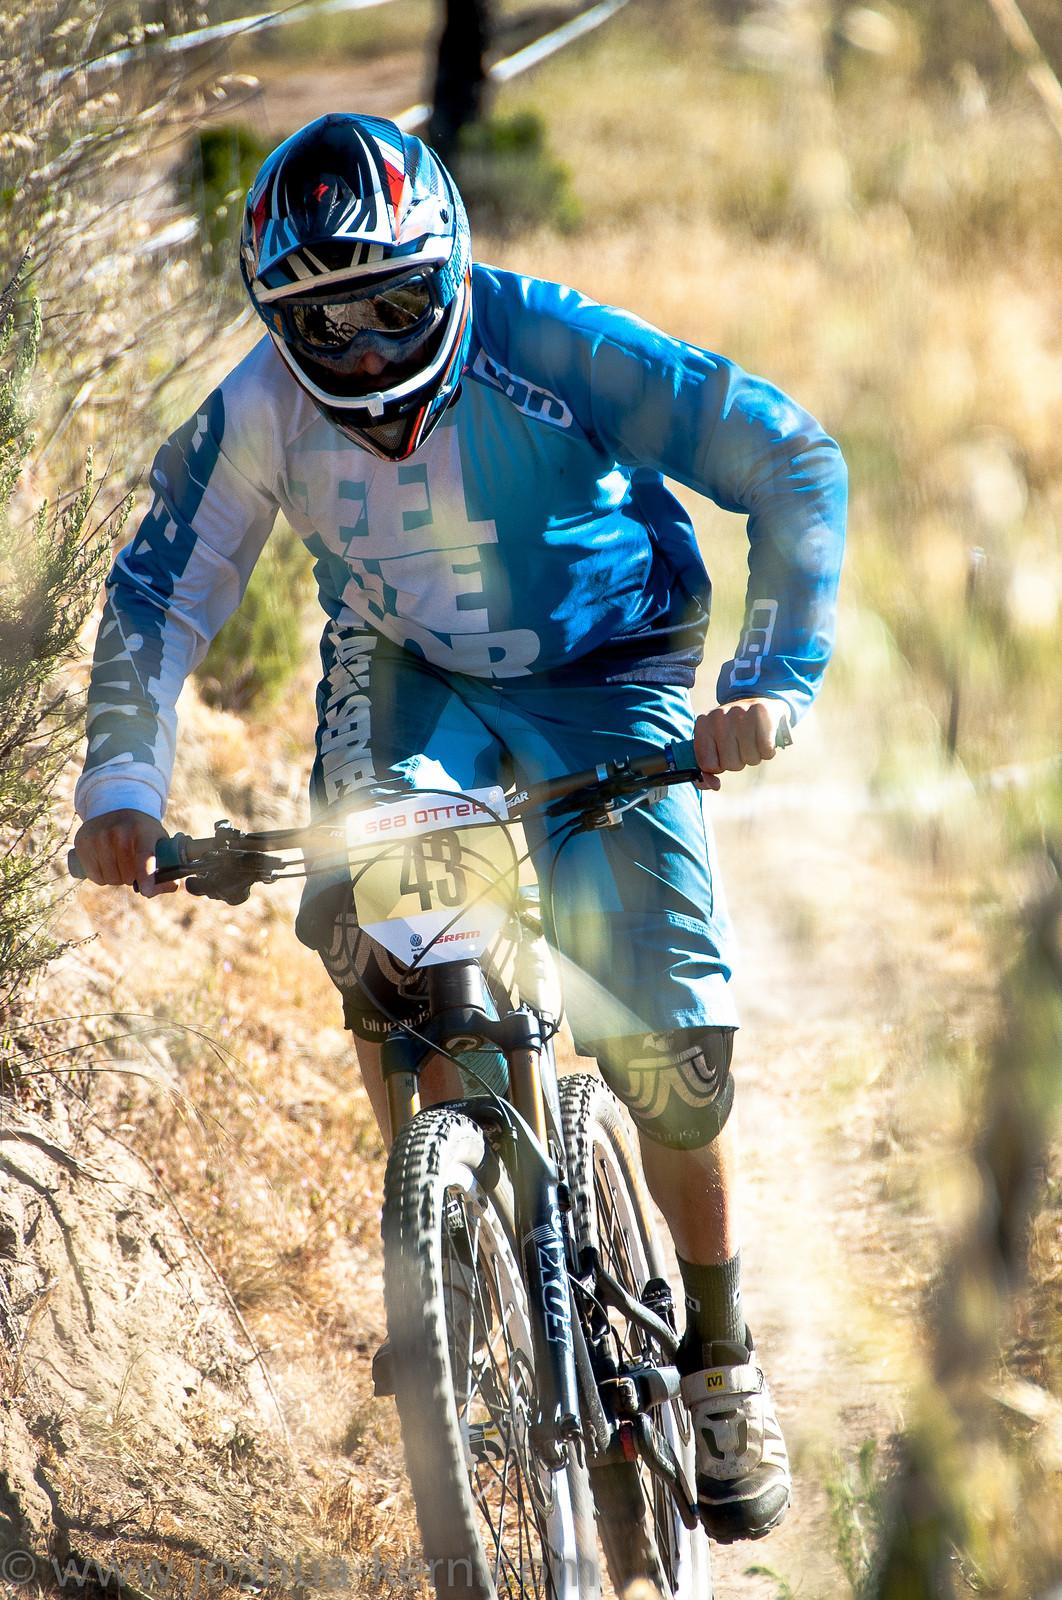 4-18-13DHPractice (5 of 17) - jkern620 - Mountain Biking Pictures - Vital MTB